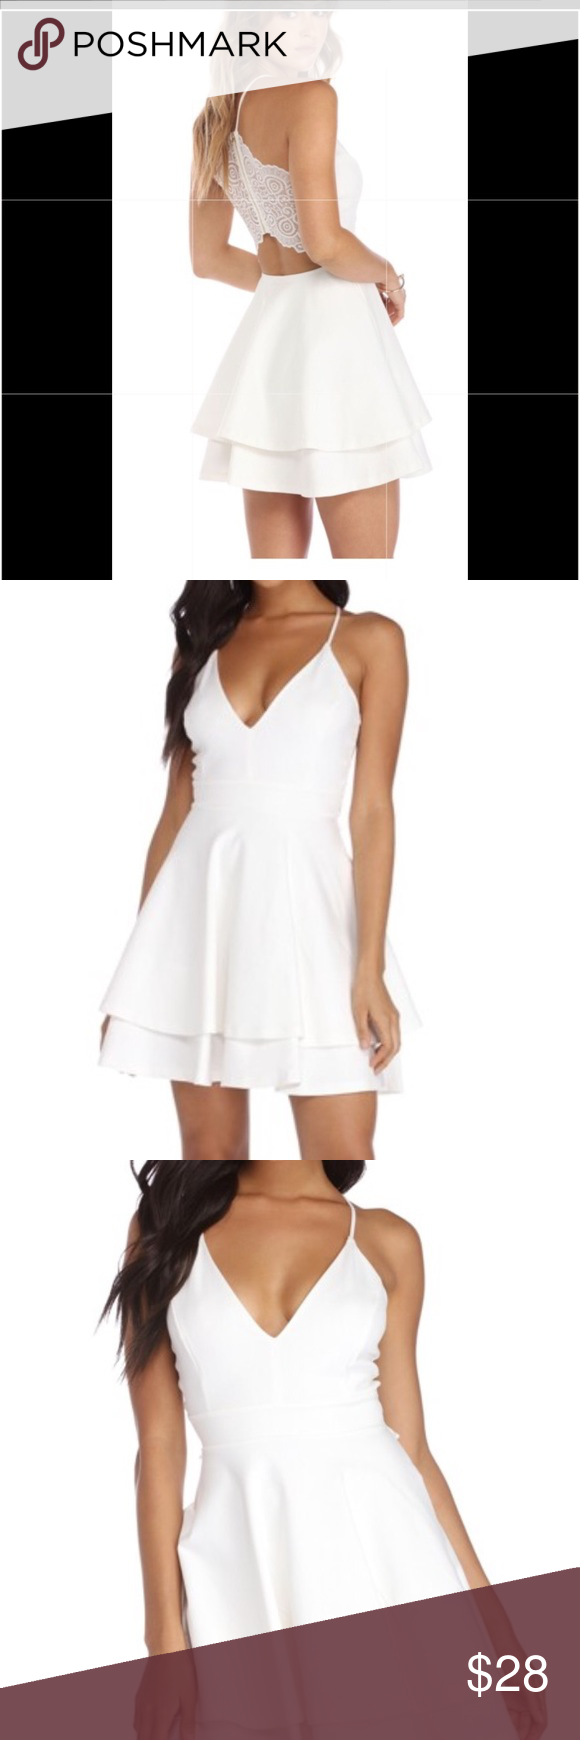 37++ Windsor white dress information